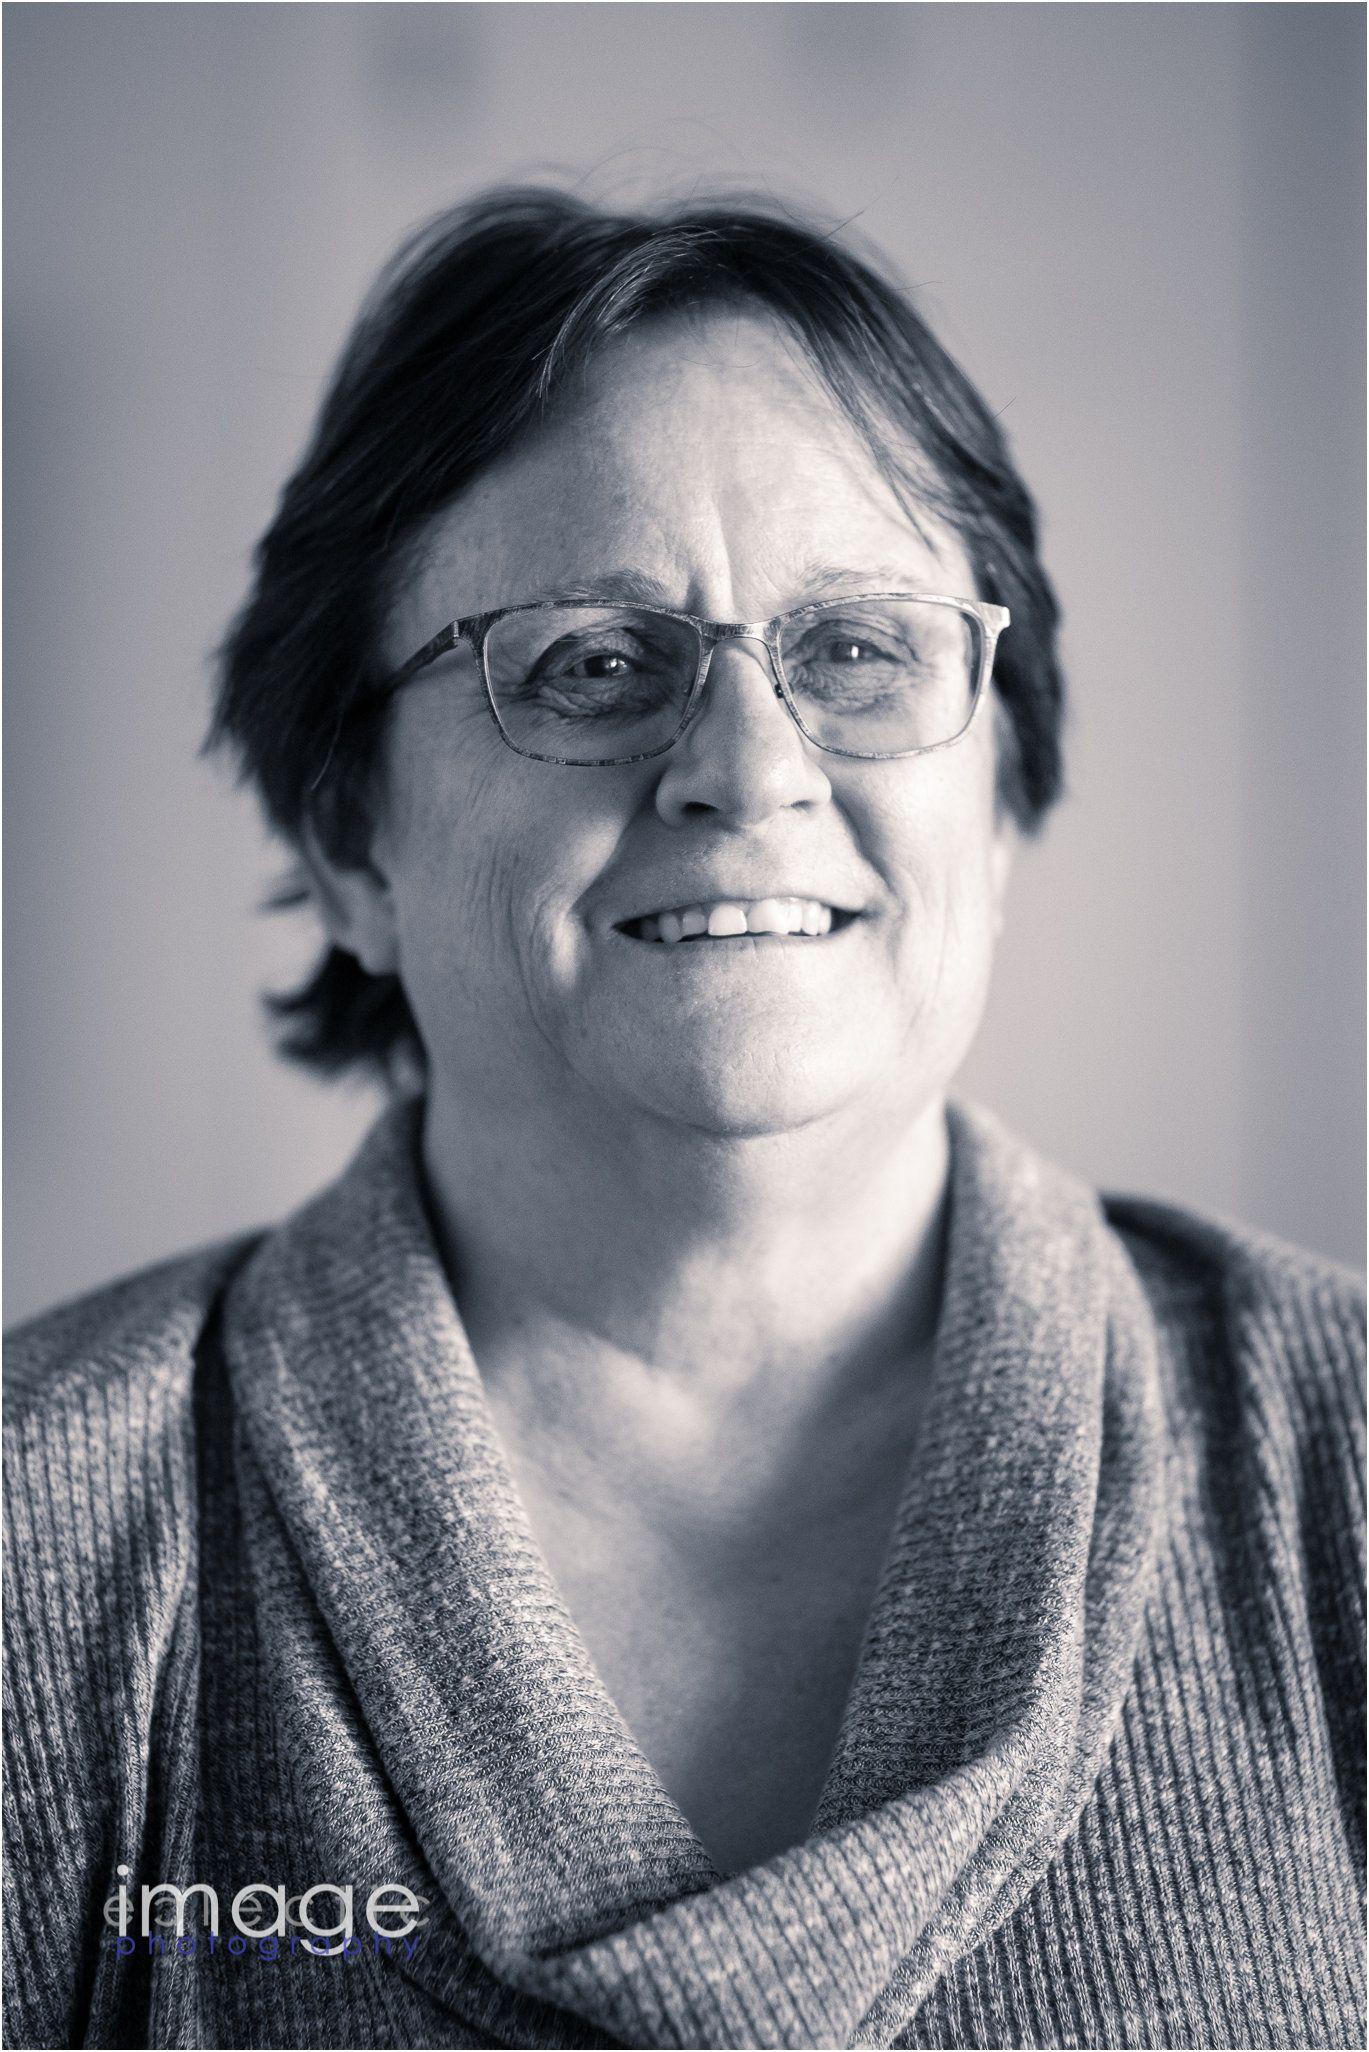 Tammy Ledbetter